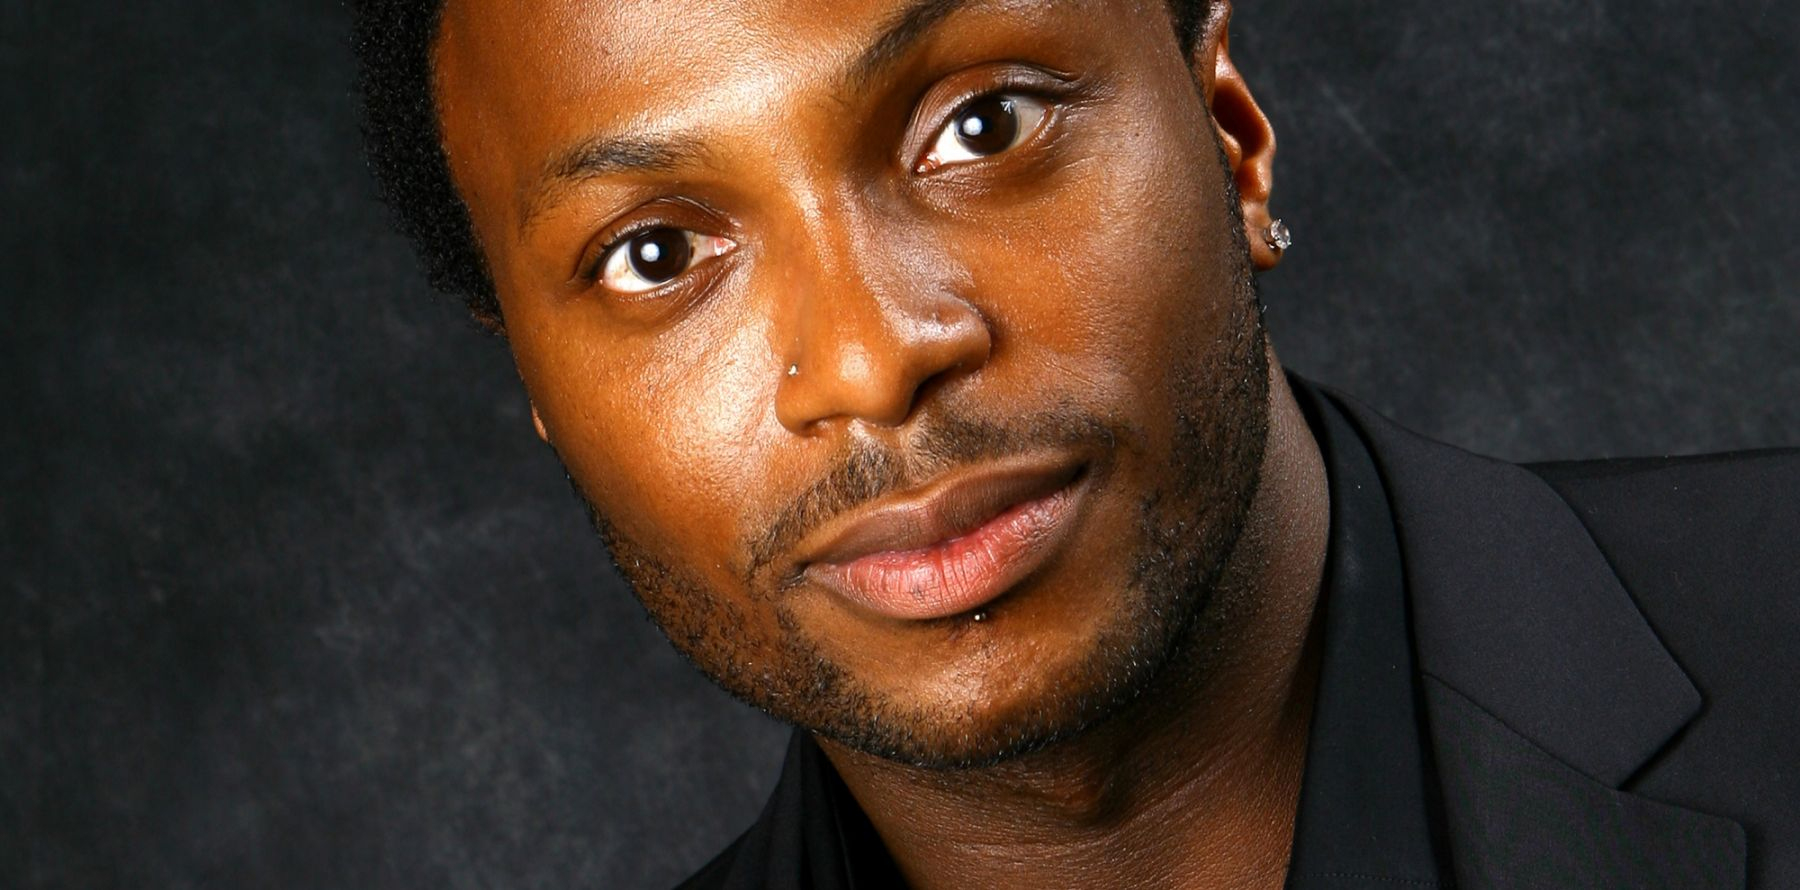 Houcine (Star Academy) Condamné Pour Violences Sur Son Ex à Star Academy 2007